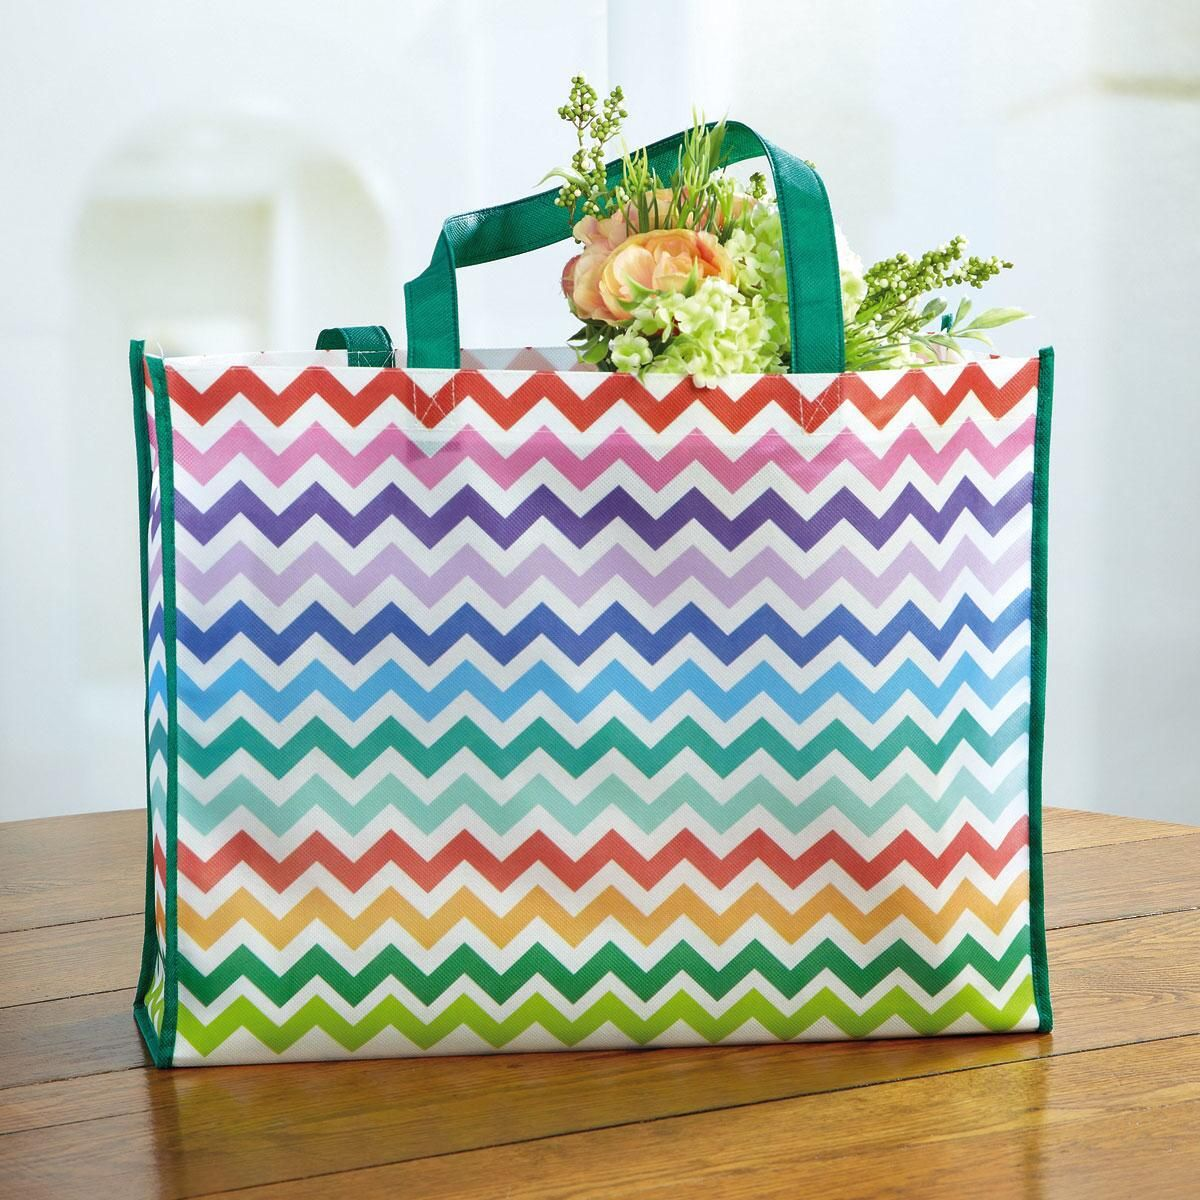 Colorful Chevron Bag Buy 1 Get 1 Free!